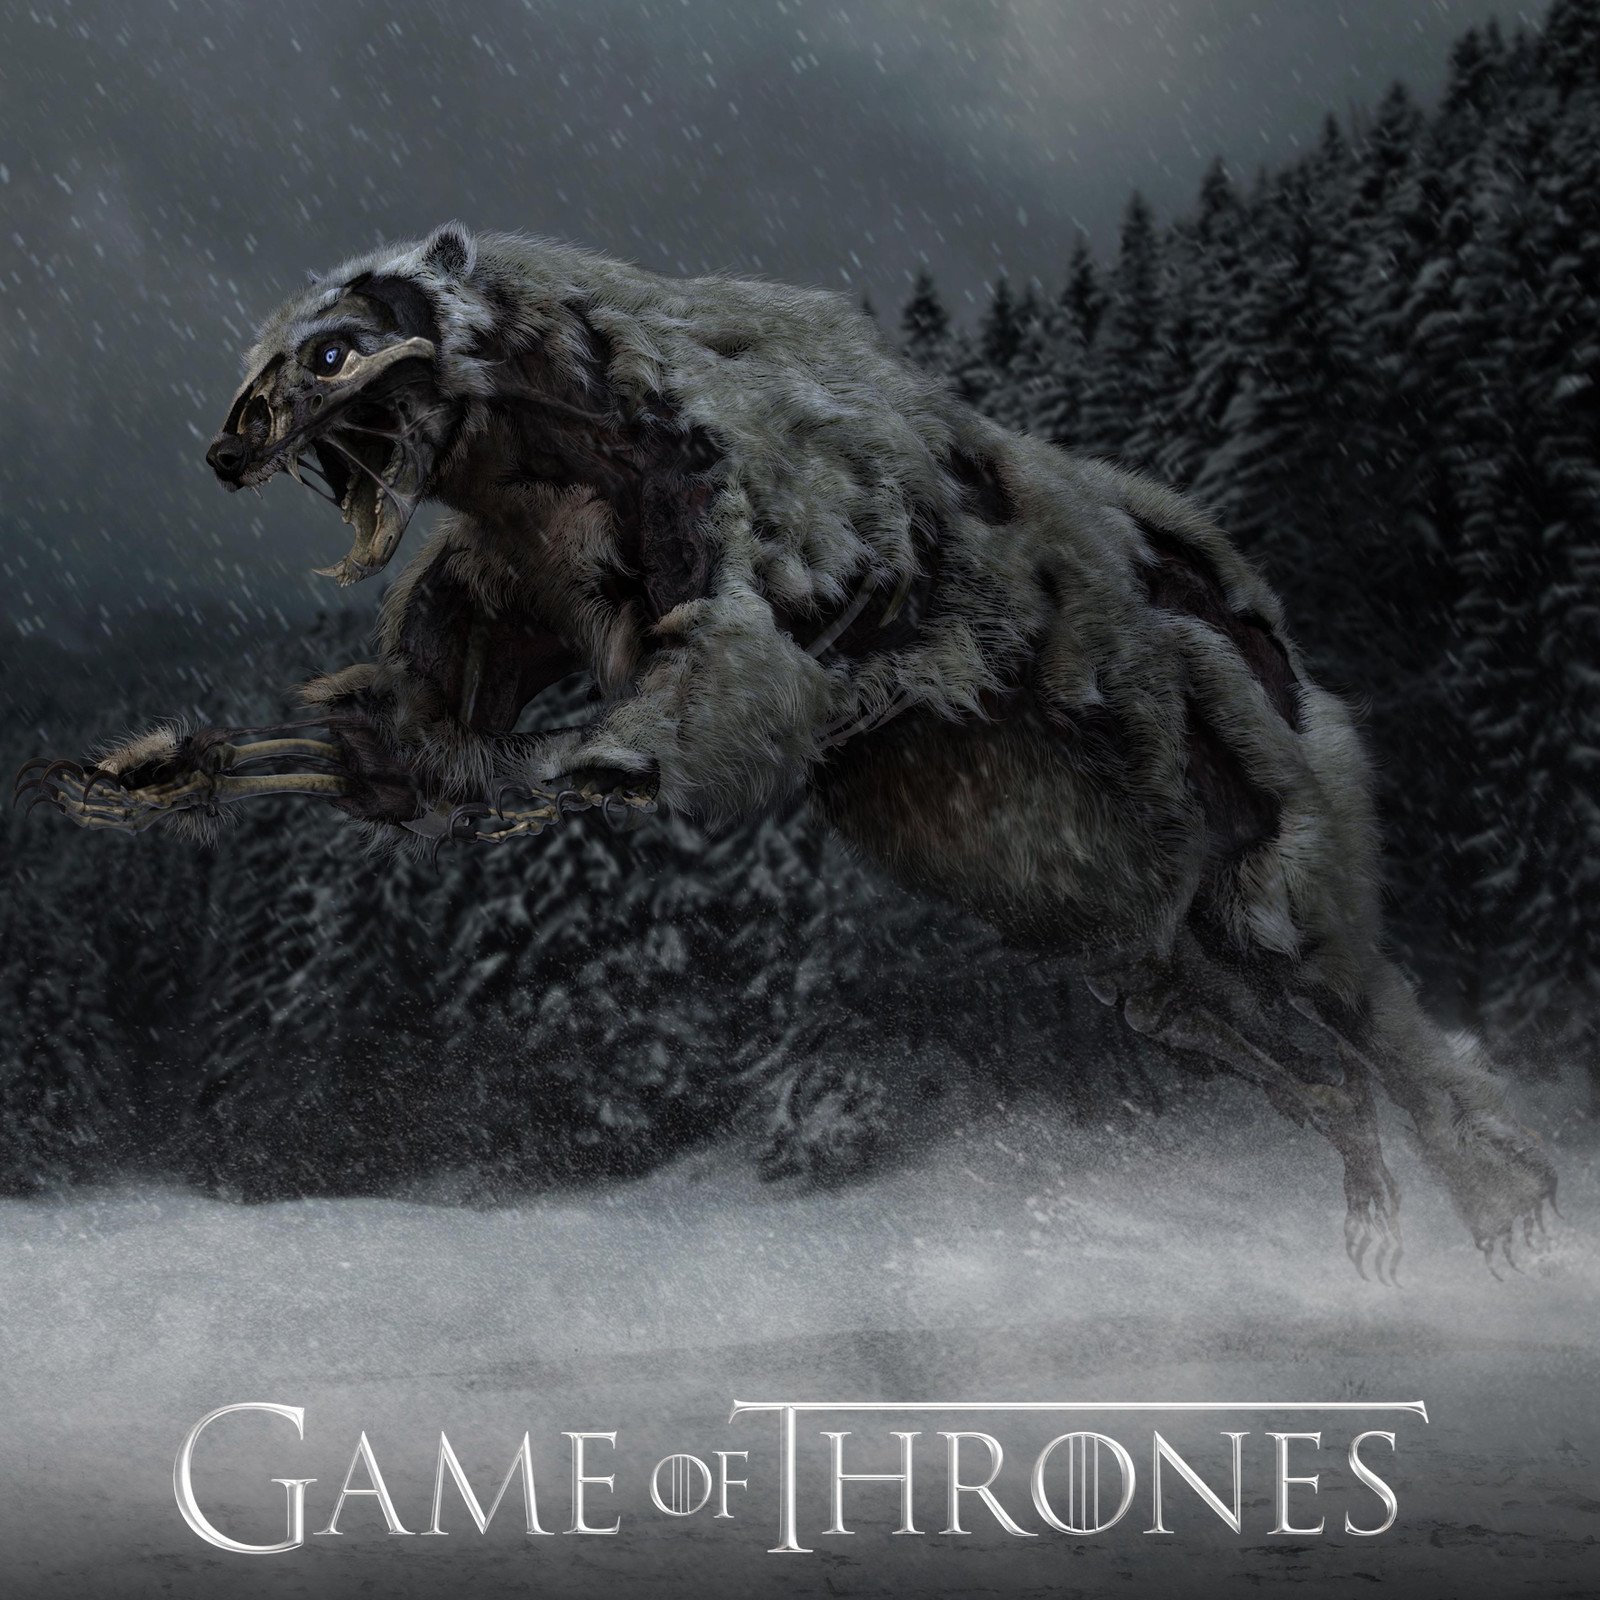 Game of Thrones - Season 7 - Polar Bear Wight